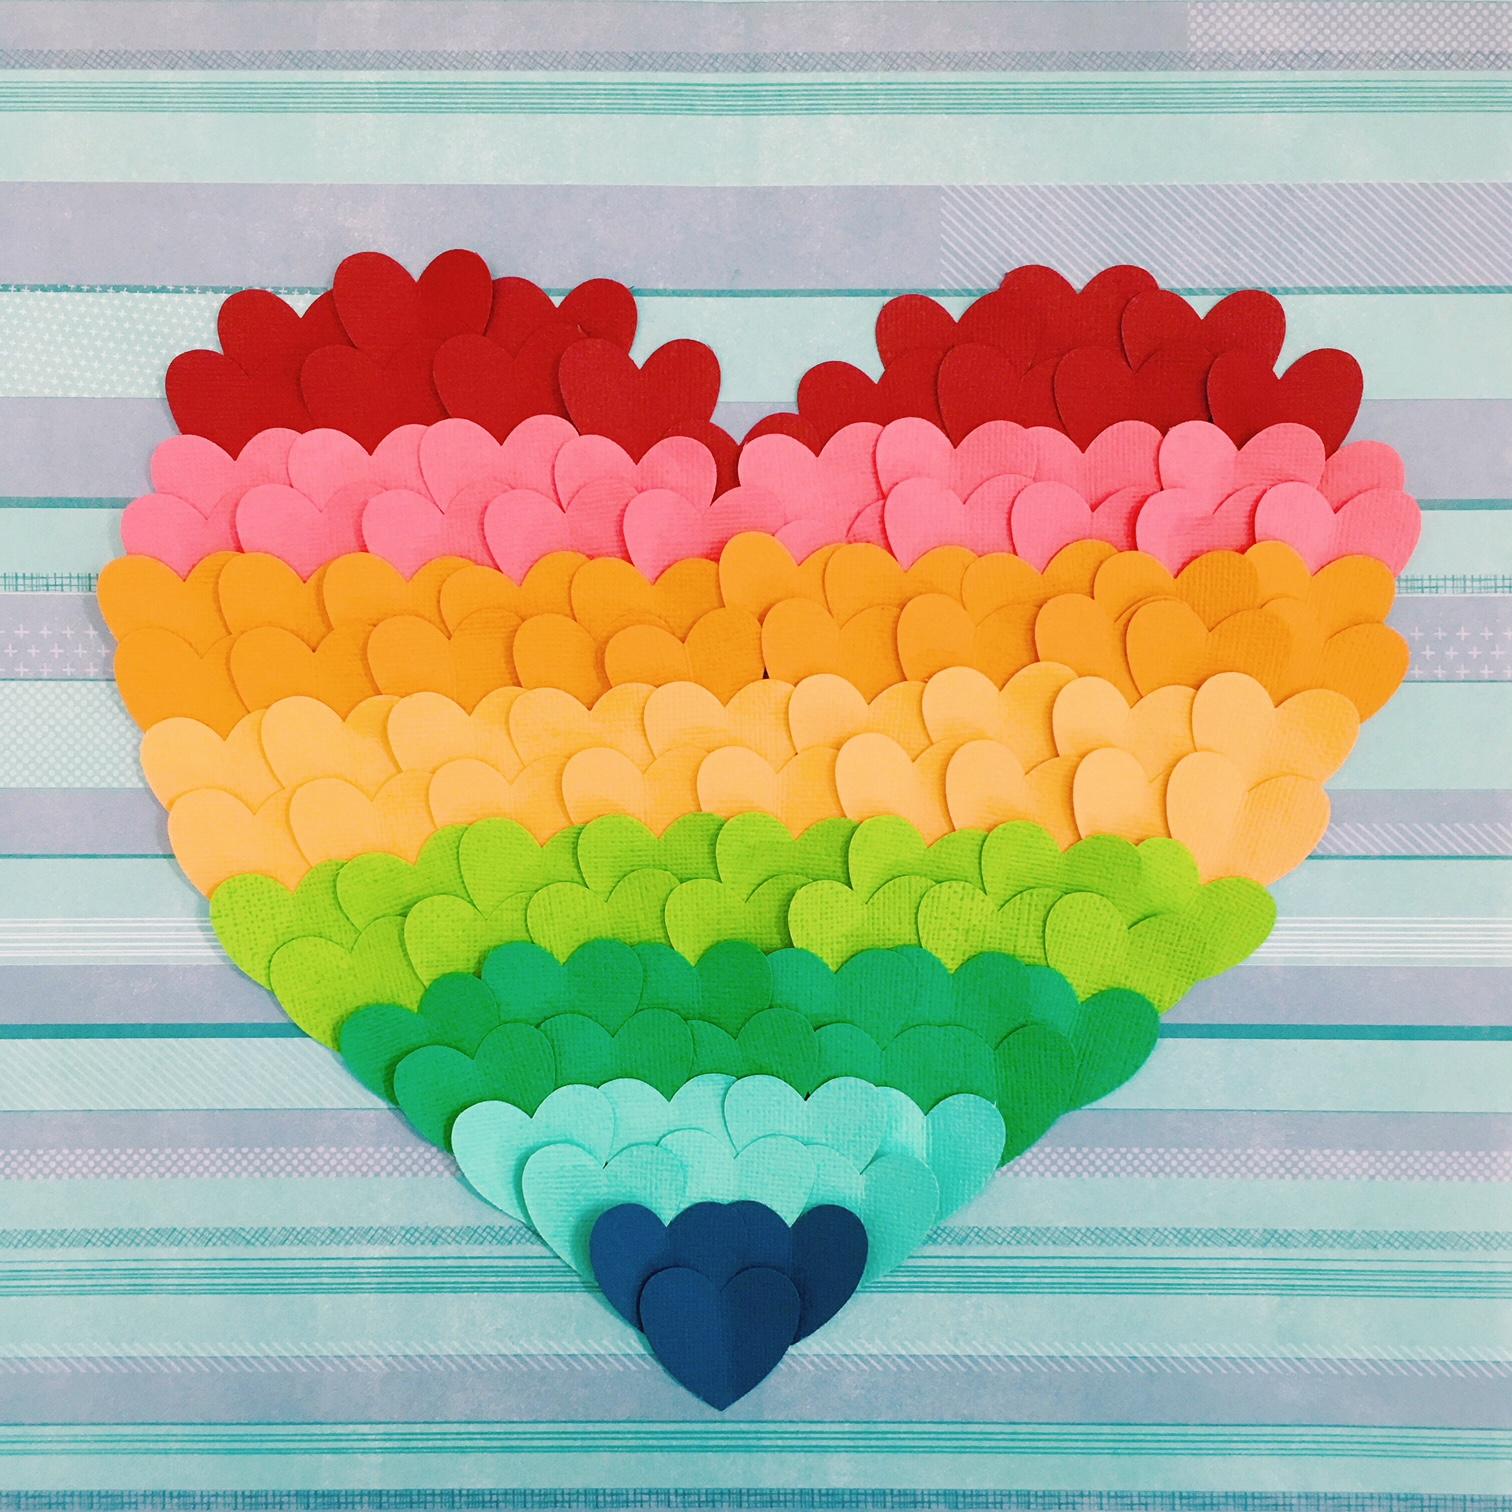 More love - paper hearts